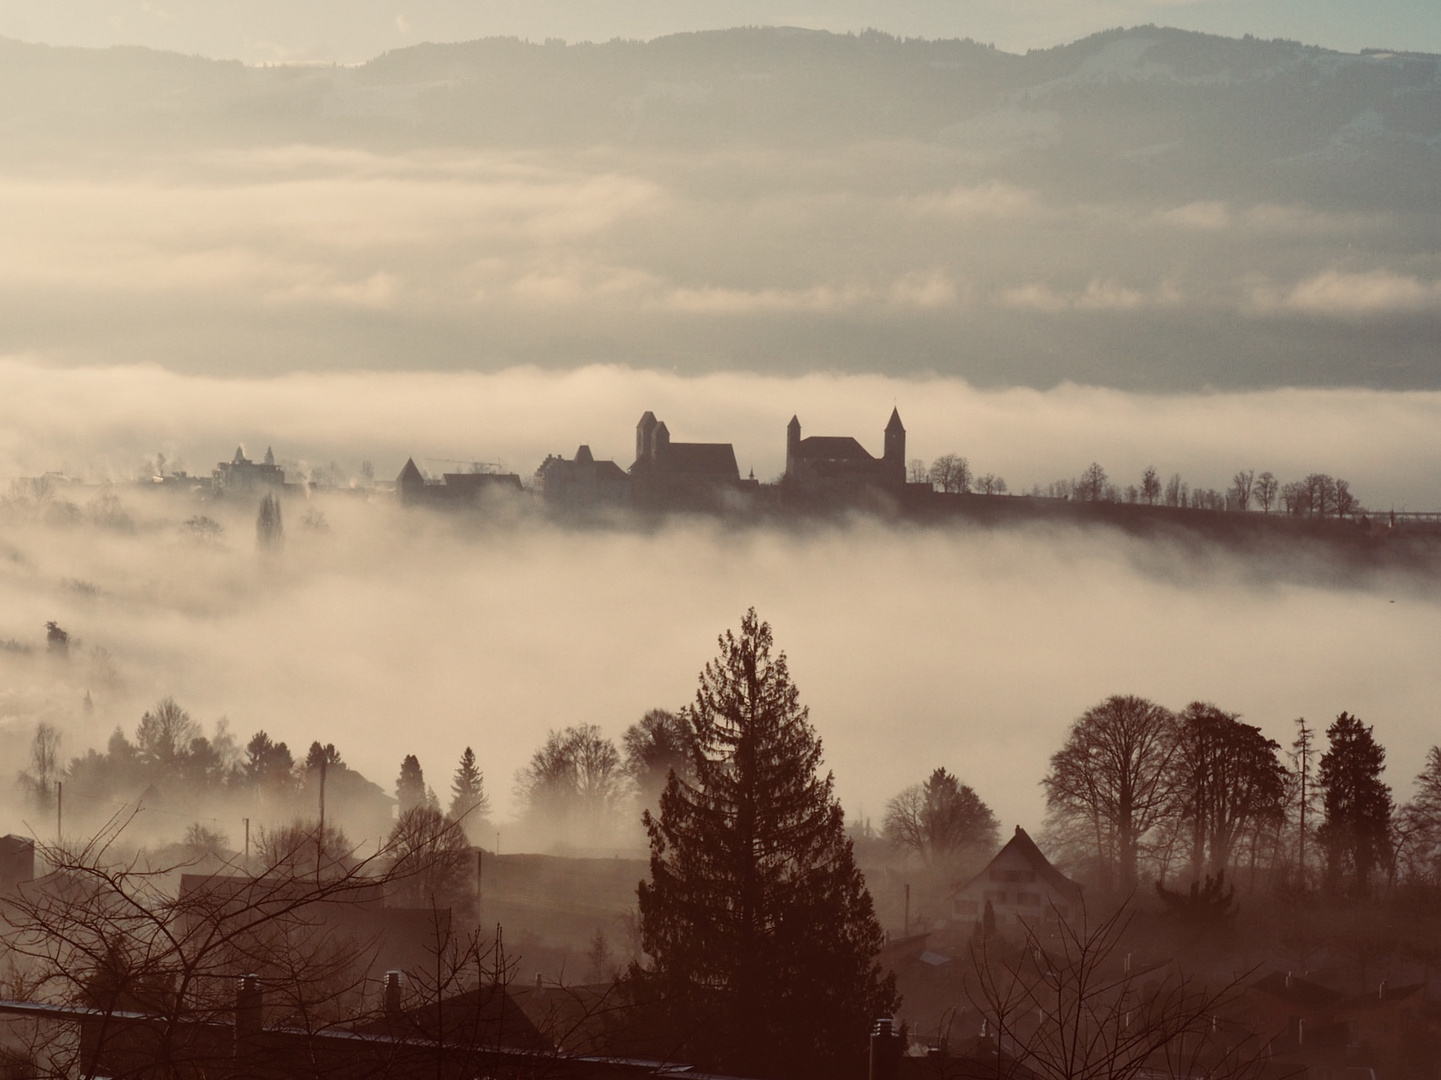 Castle of Rapperswil in fog